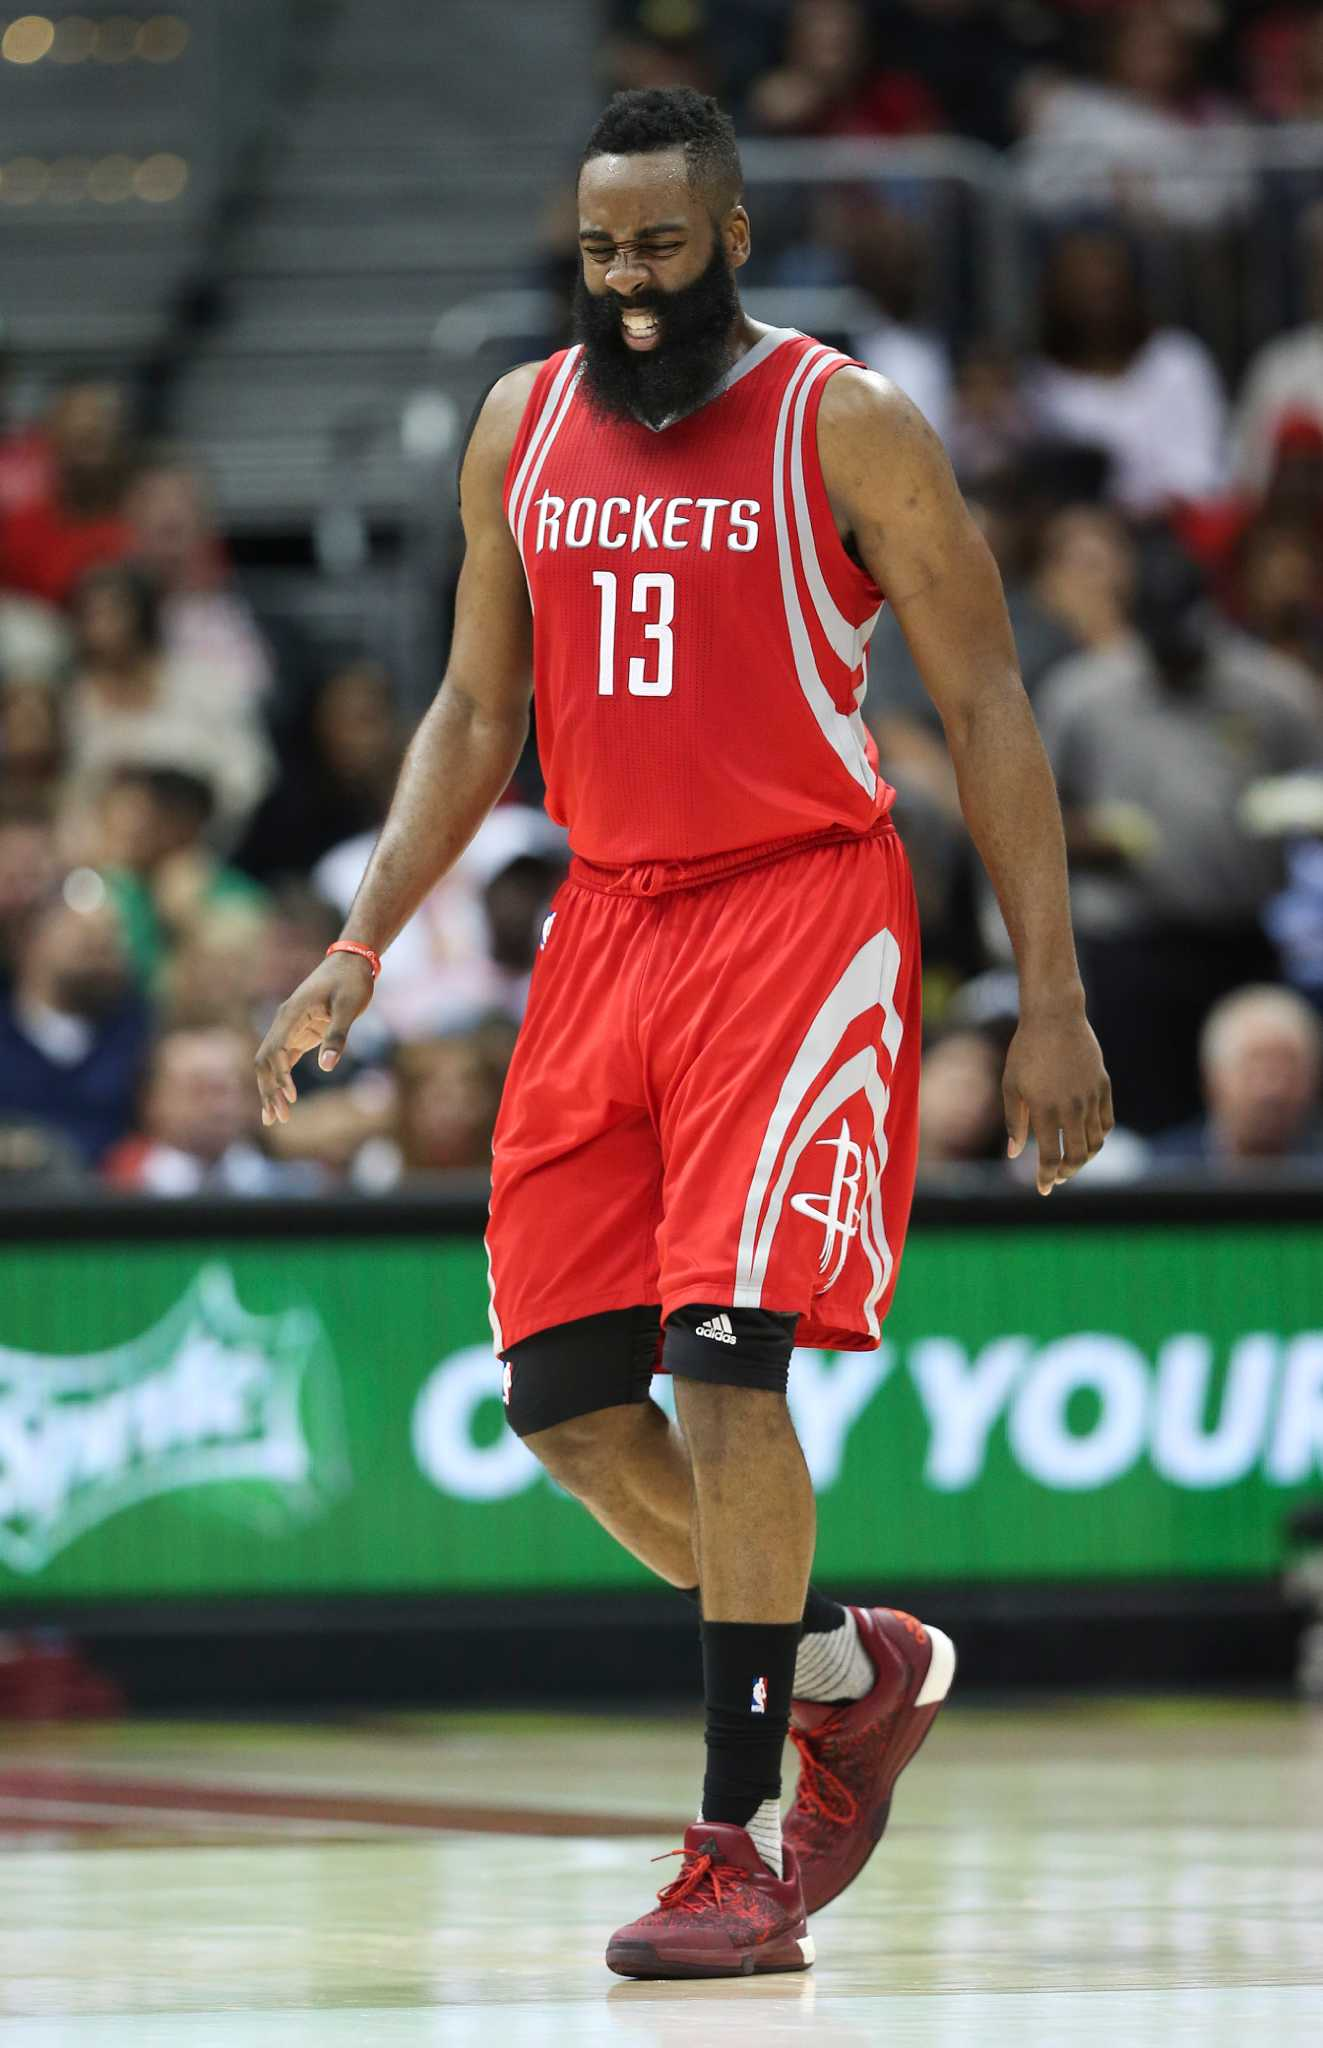 Rockets optimistic James Harden will play tonight